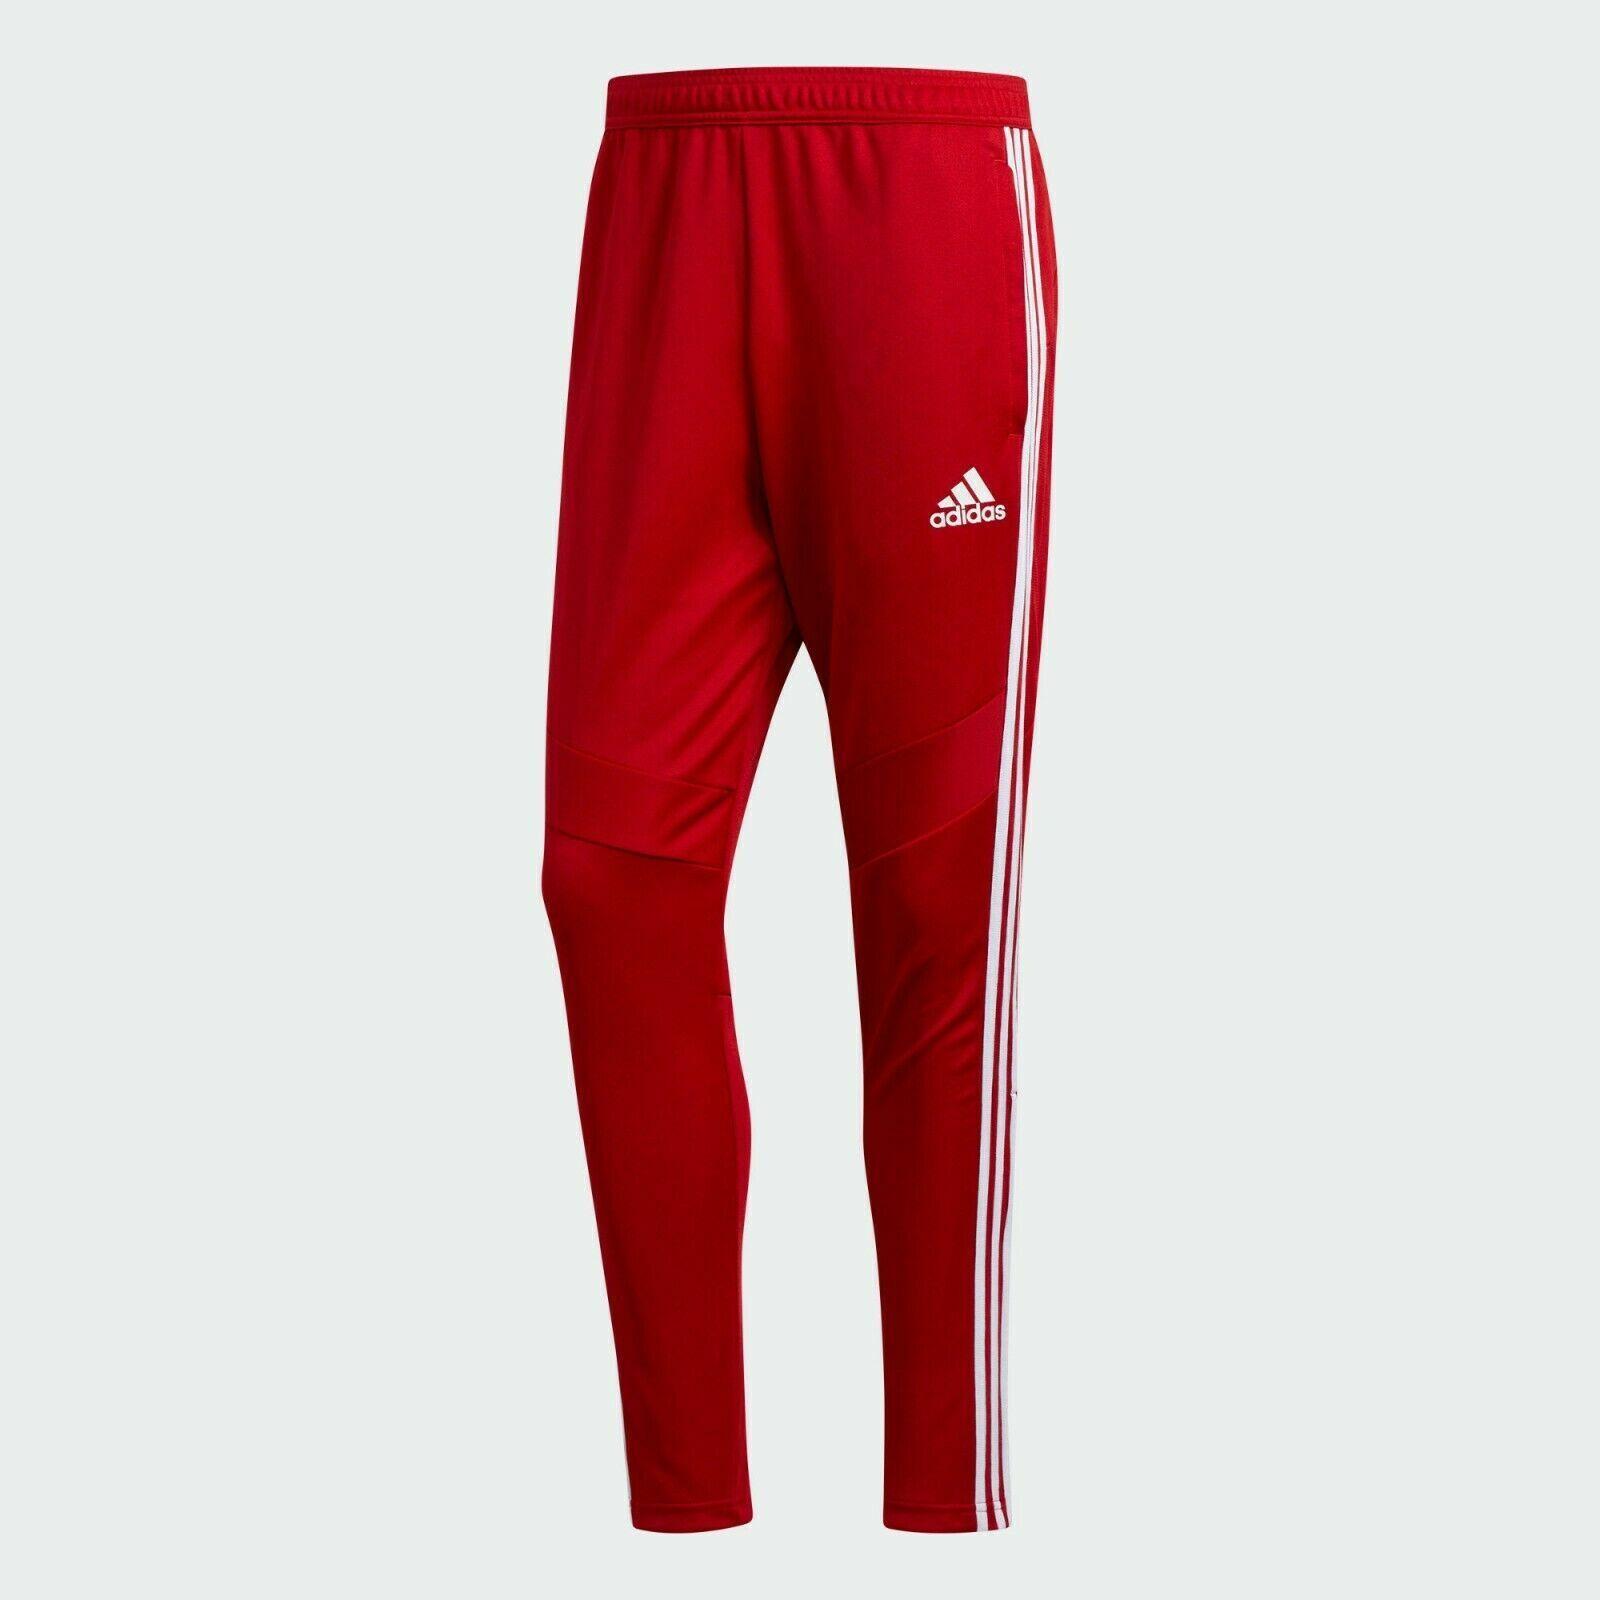 {Adidas} Men's Soccer Trio 19 Training Pants RED/WHITE - DZ8768